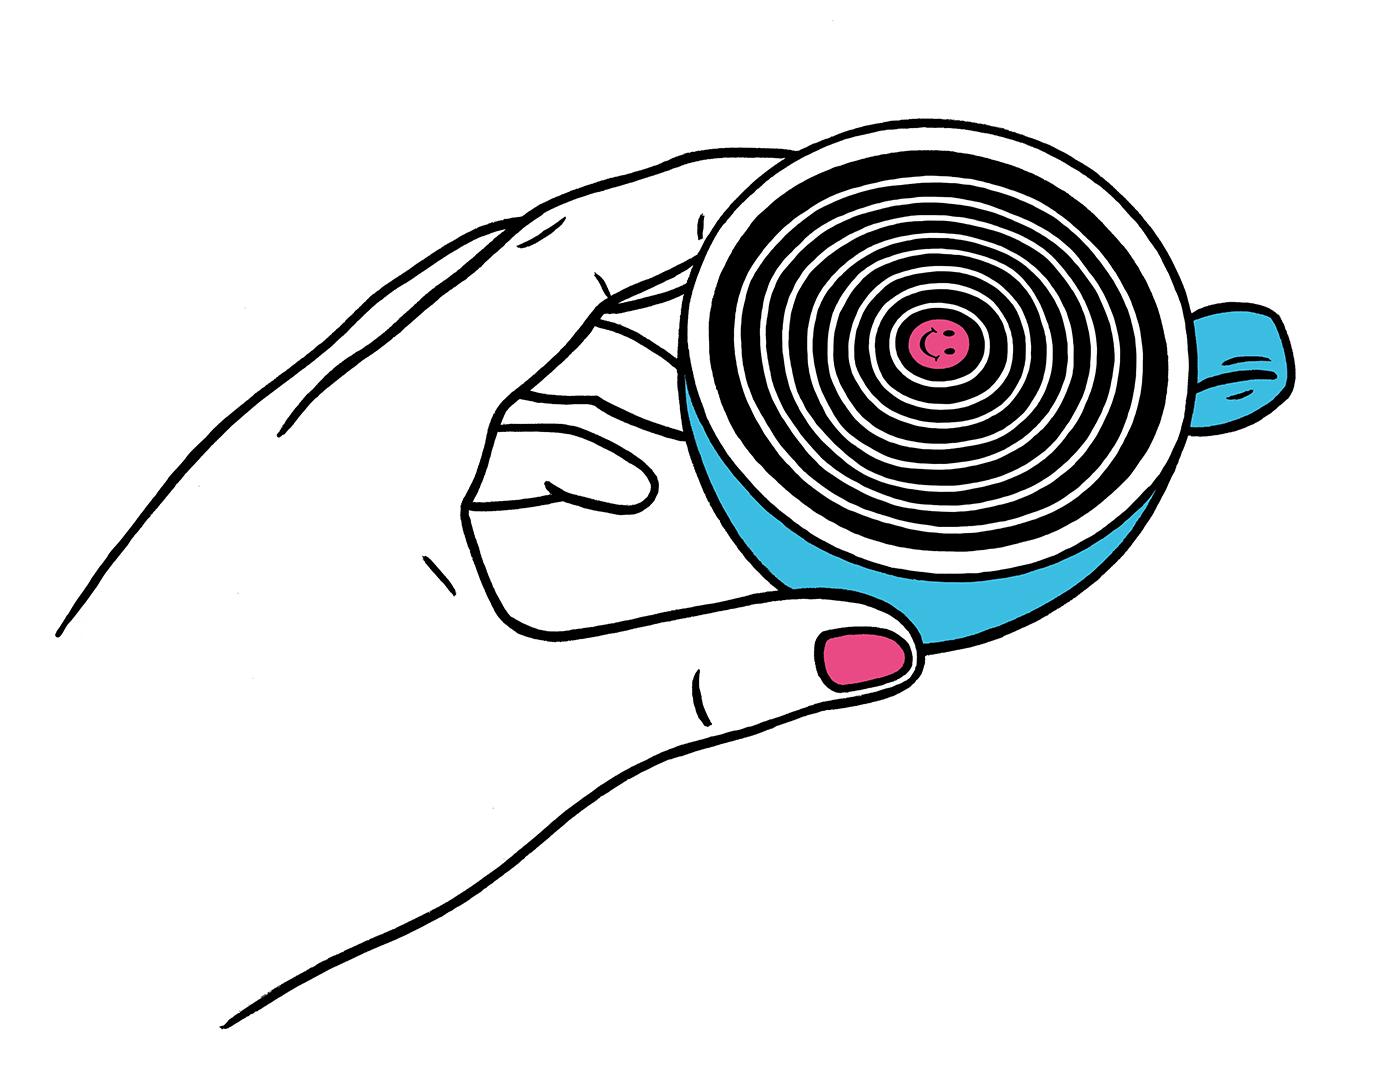 Coffee-with-LSD